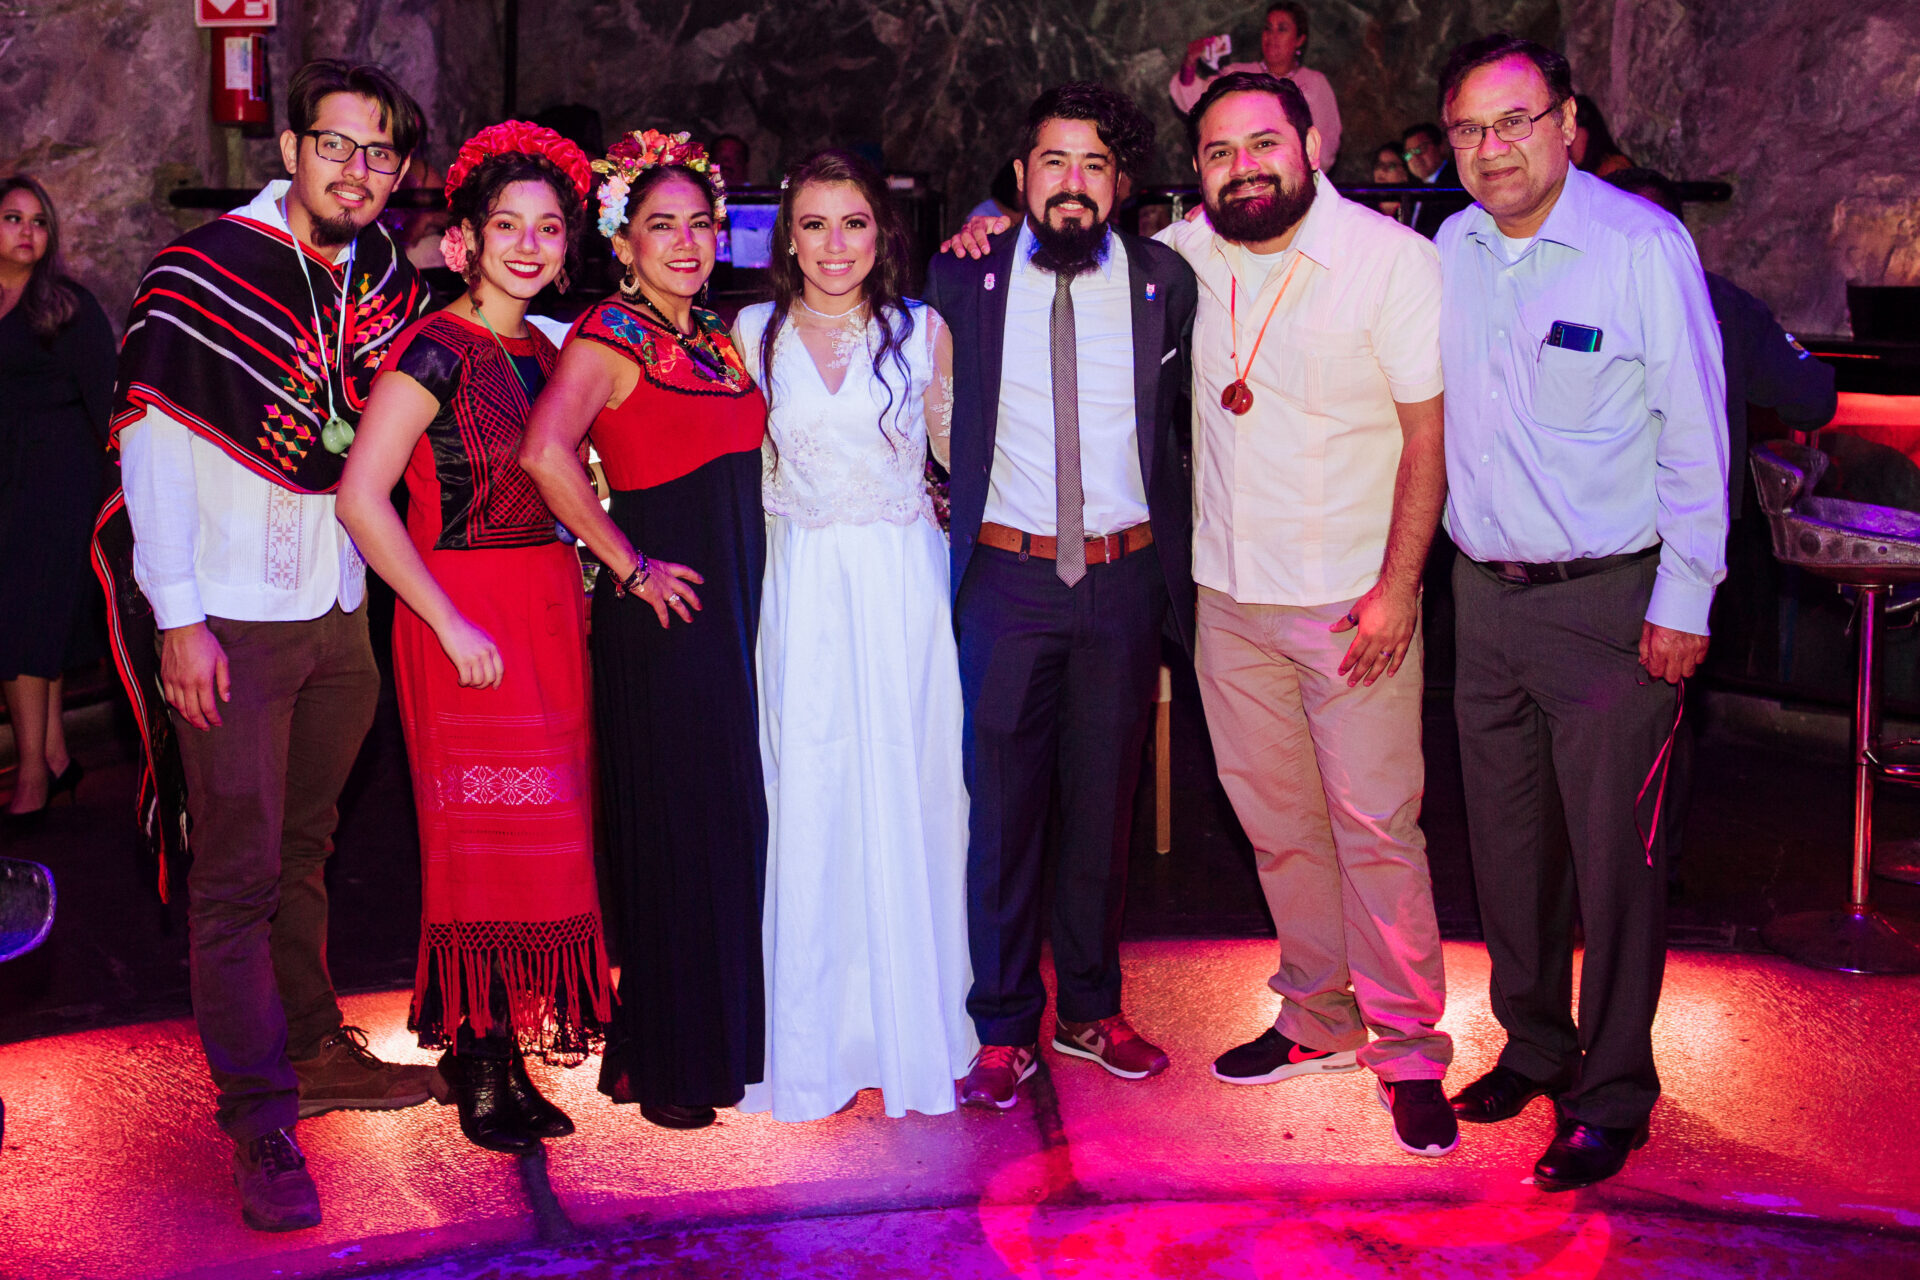 javier_noriega_fotografo_bodas_la_mina_club_zacatecas_wedding_photographer6